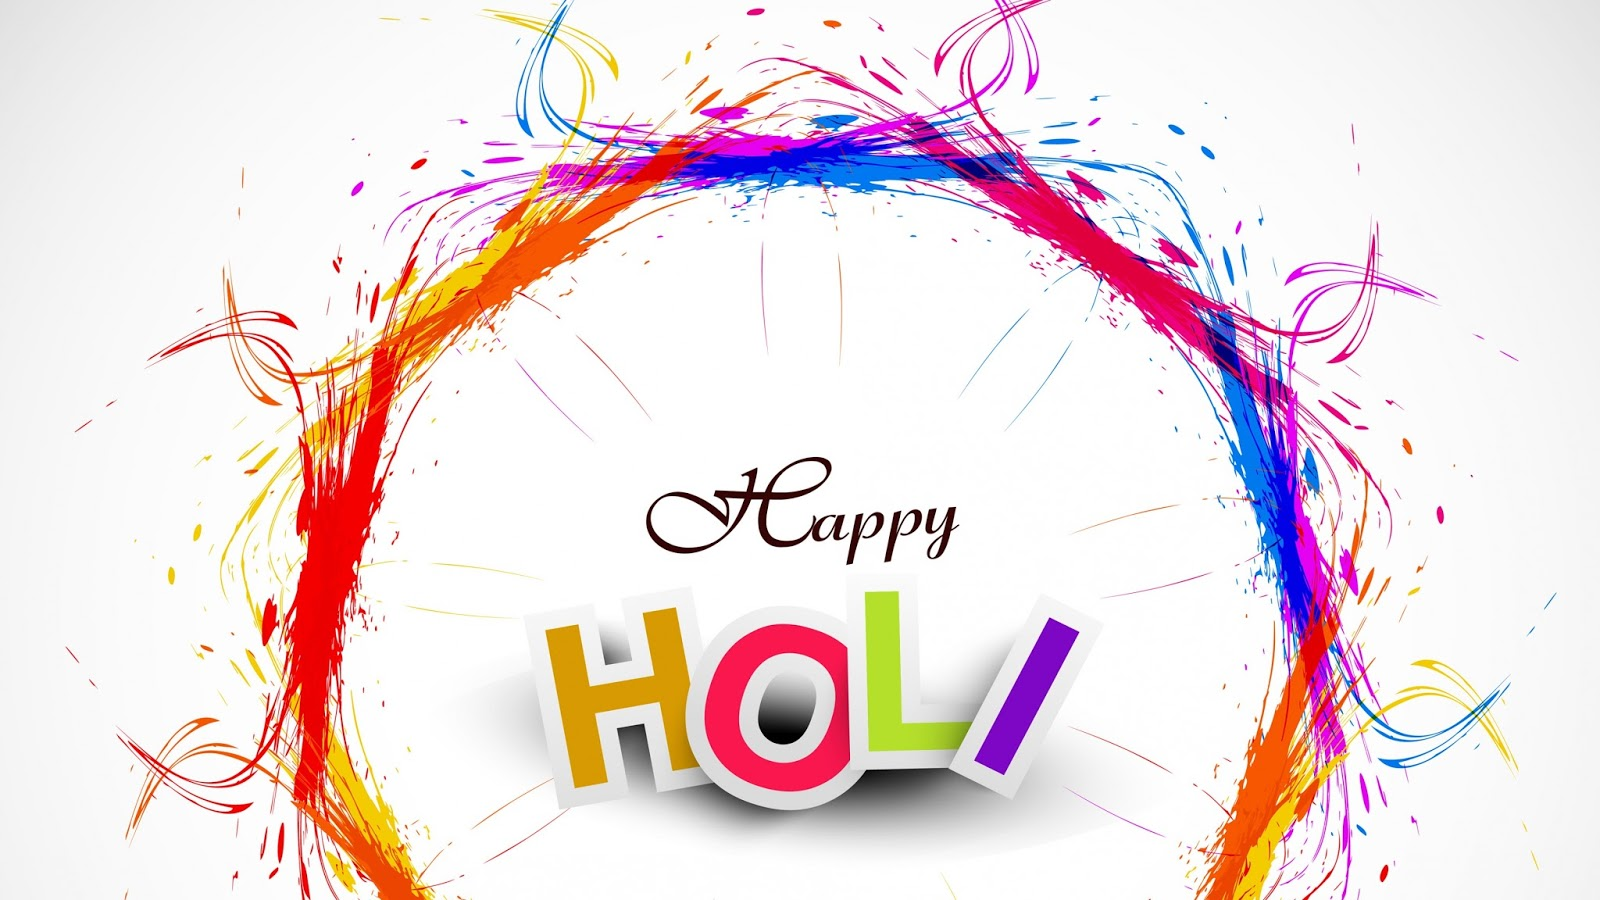 Holi Wallpaper For Facebook Profile - Holi Hd , HD Wallpaper & Backgrounds